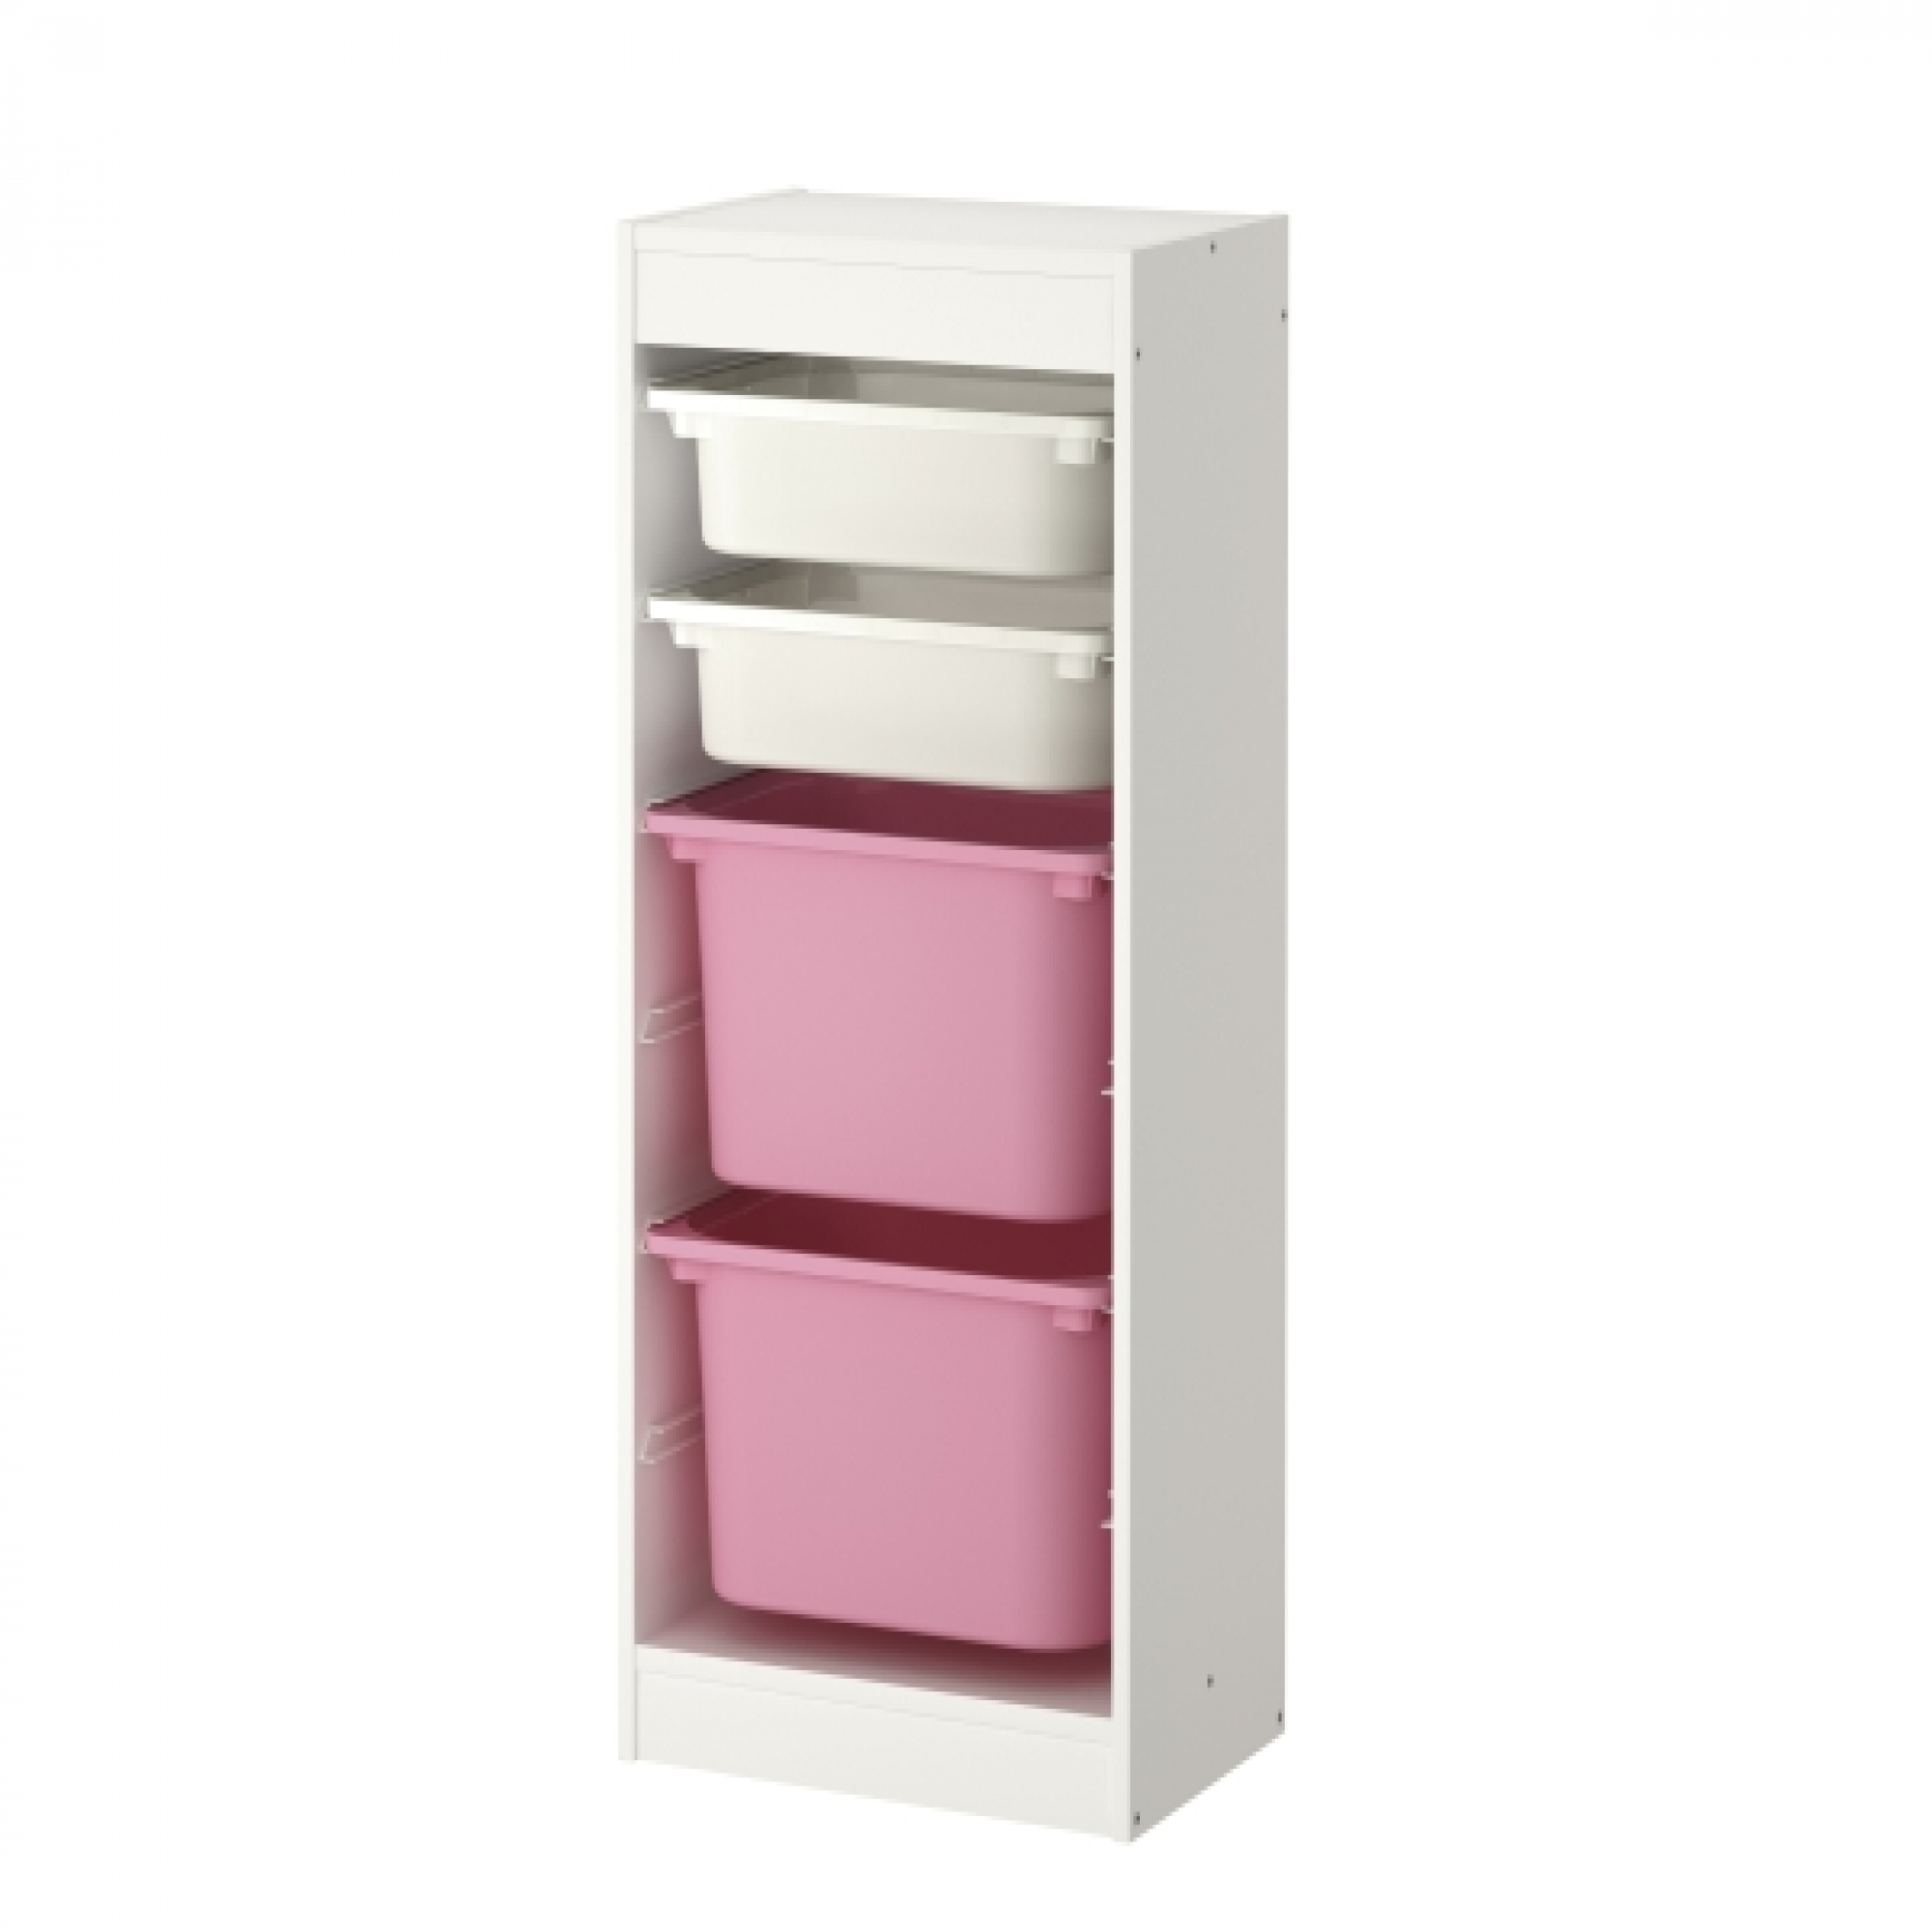 Trofast combinaci n de almacenaje cajas - Ikea cajas almacenaje ropa ...